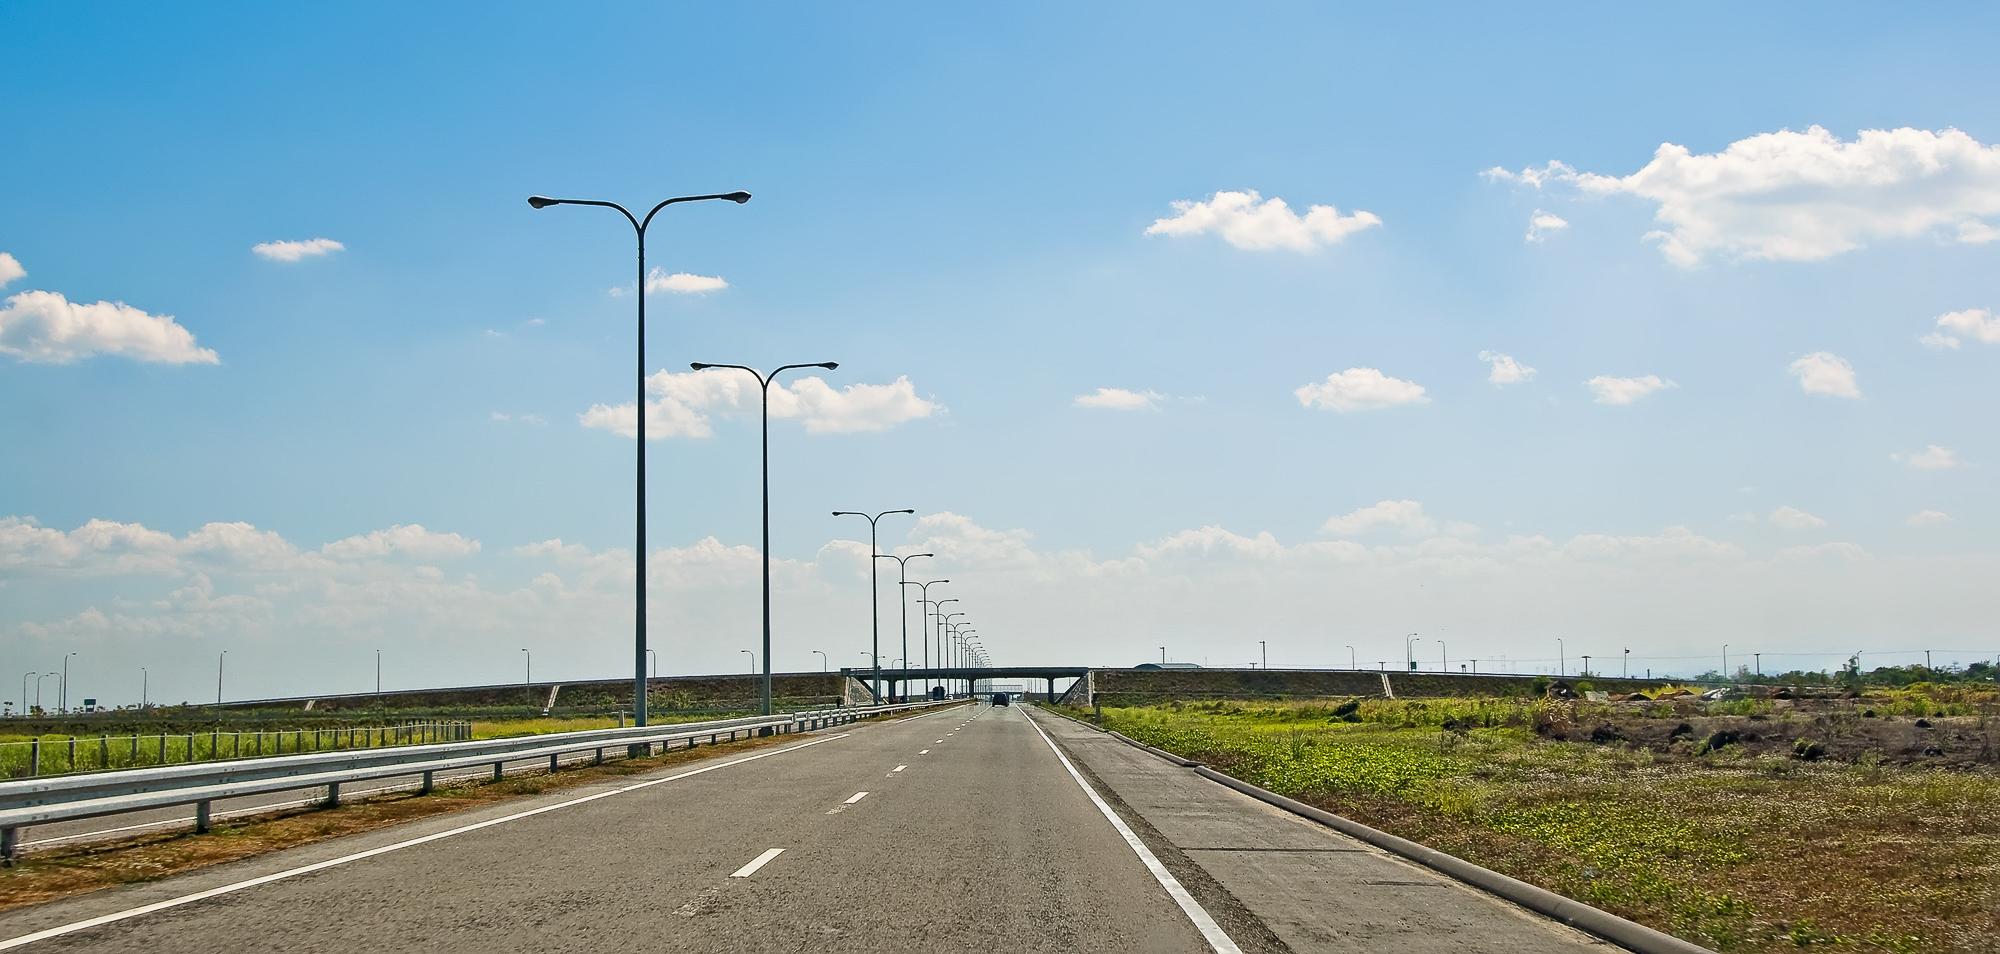 Top 10 Road Trip Destinations Near Manila